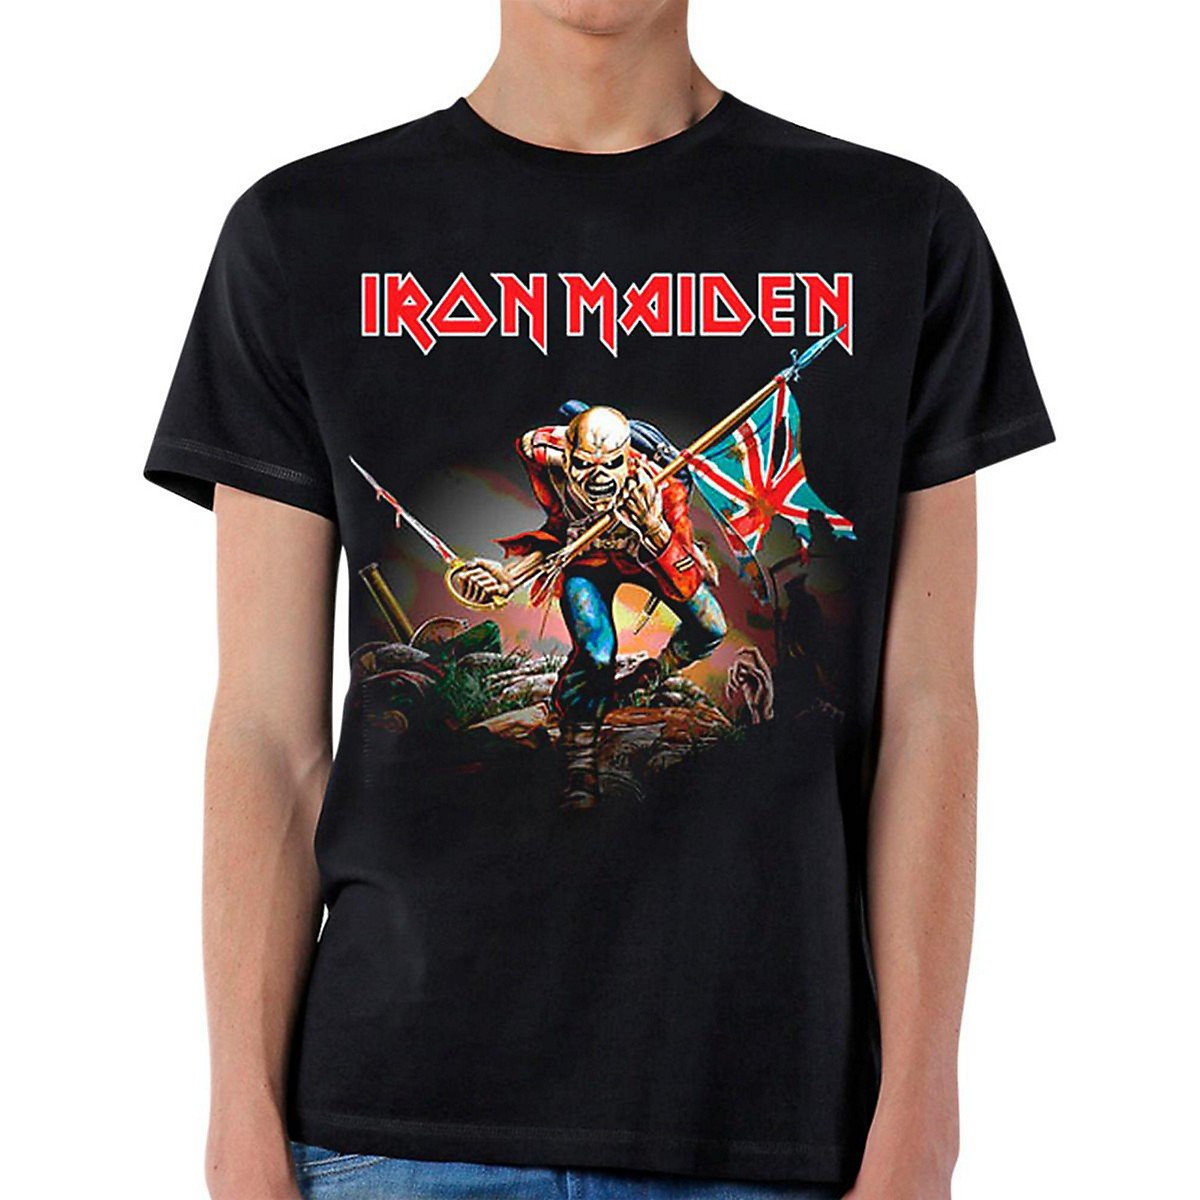 Iron Maiden The Trooper T-Shirt S, Black